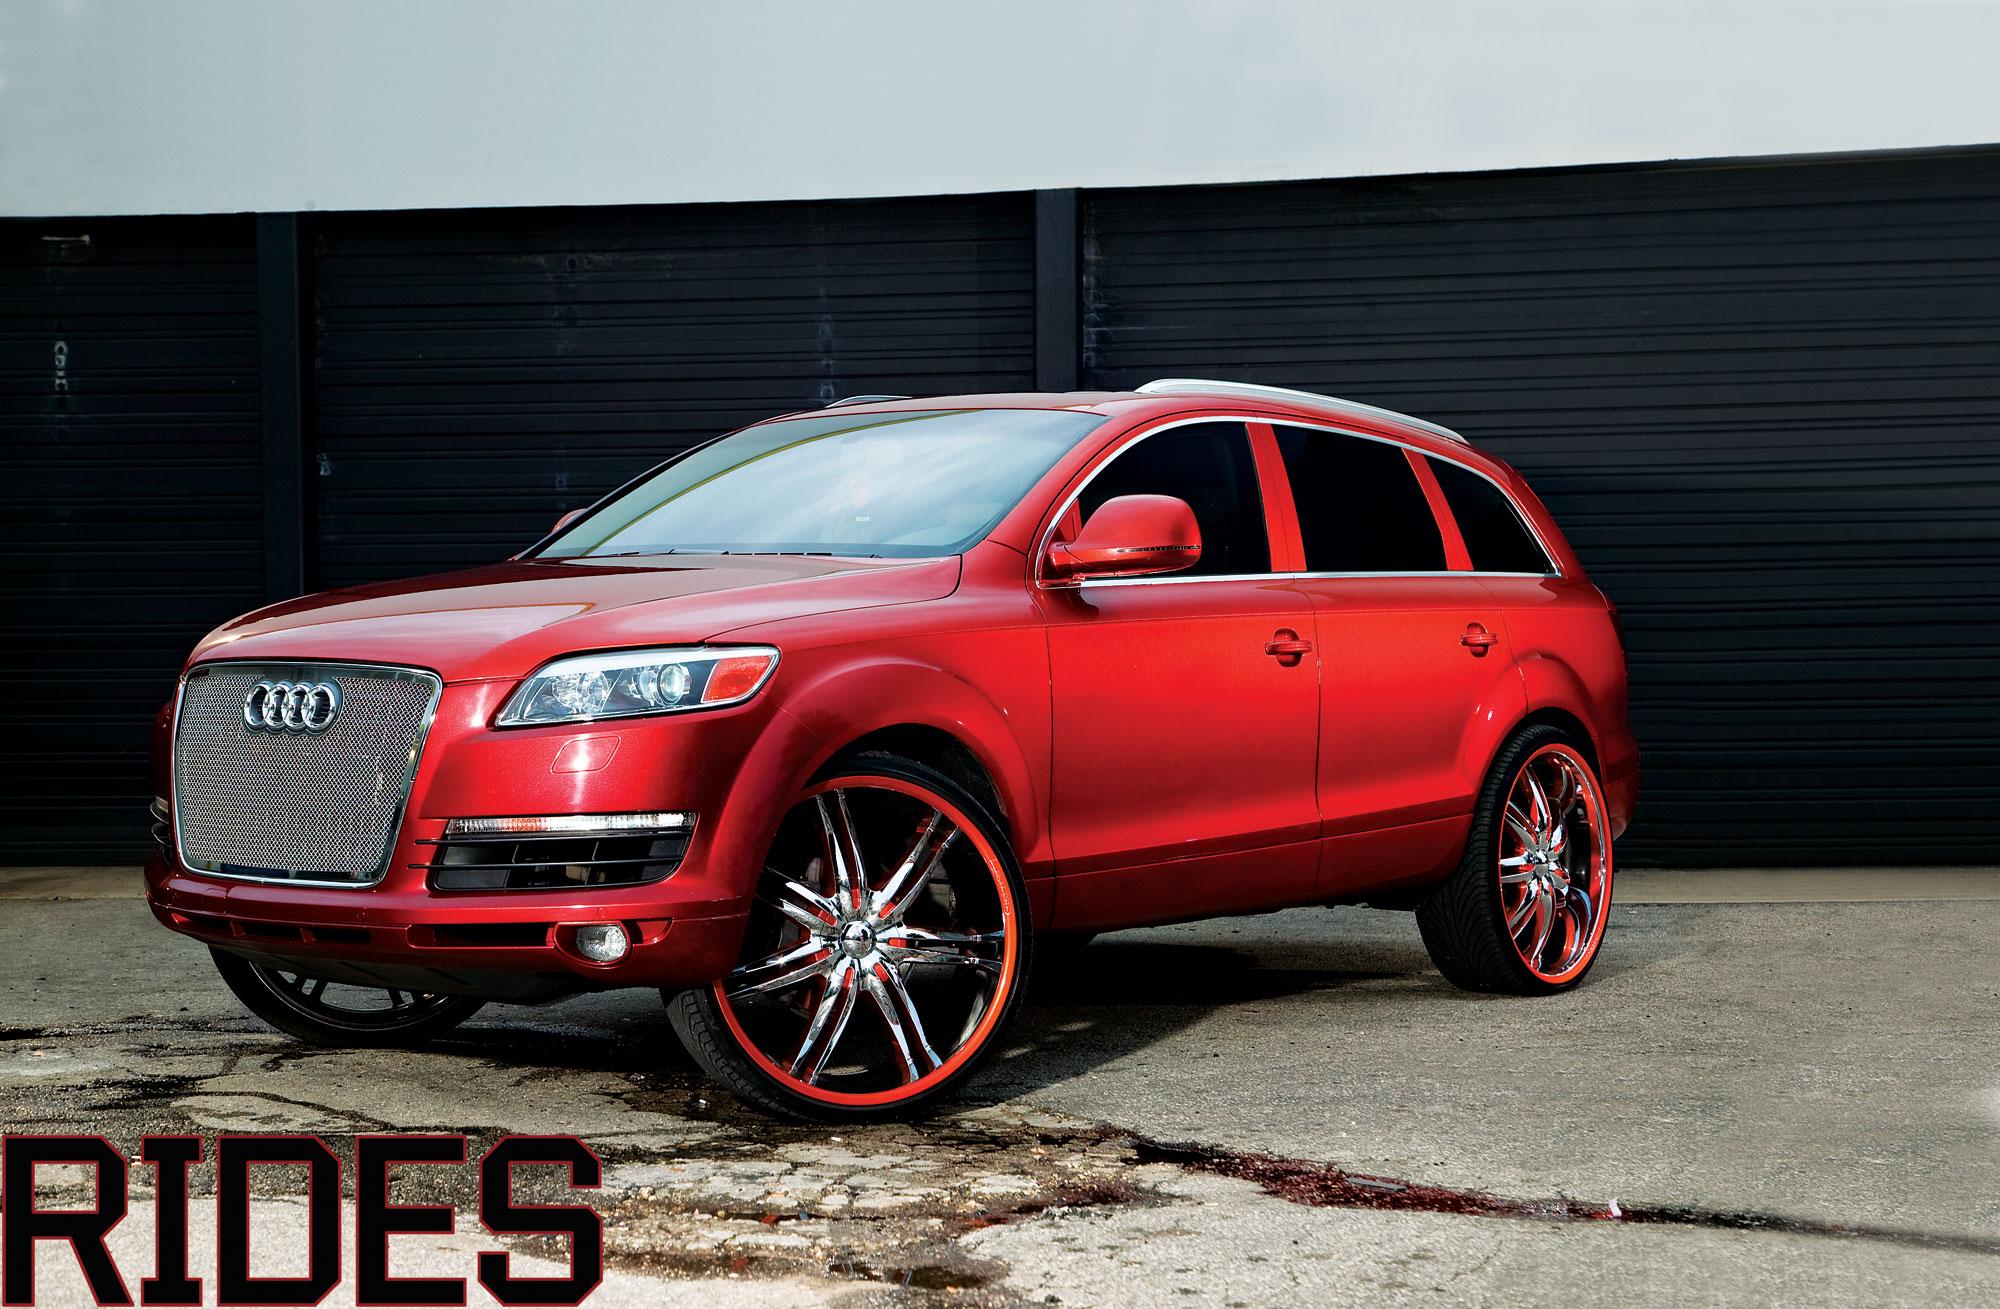 2008 Audi Q7 Rides Magazine